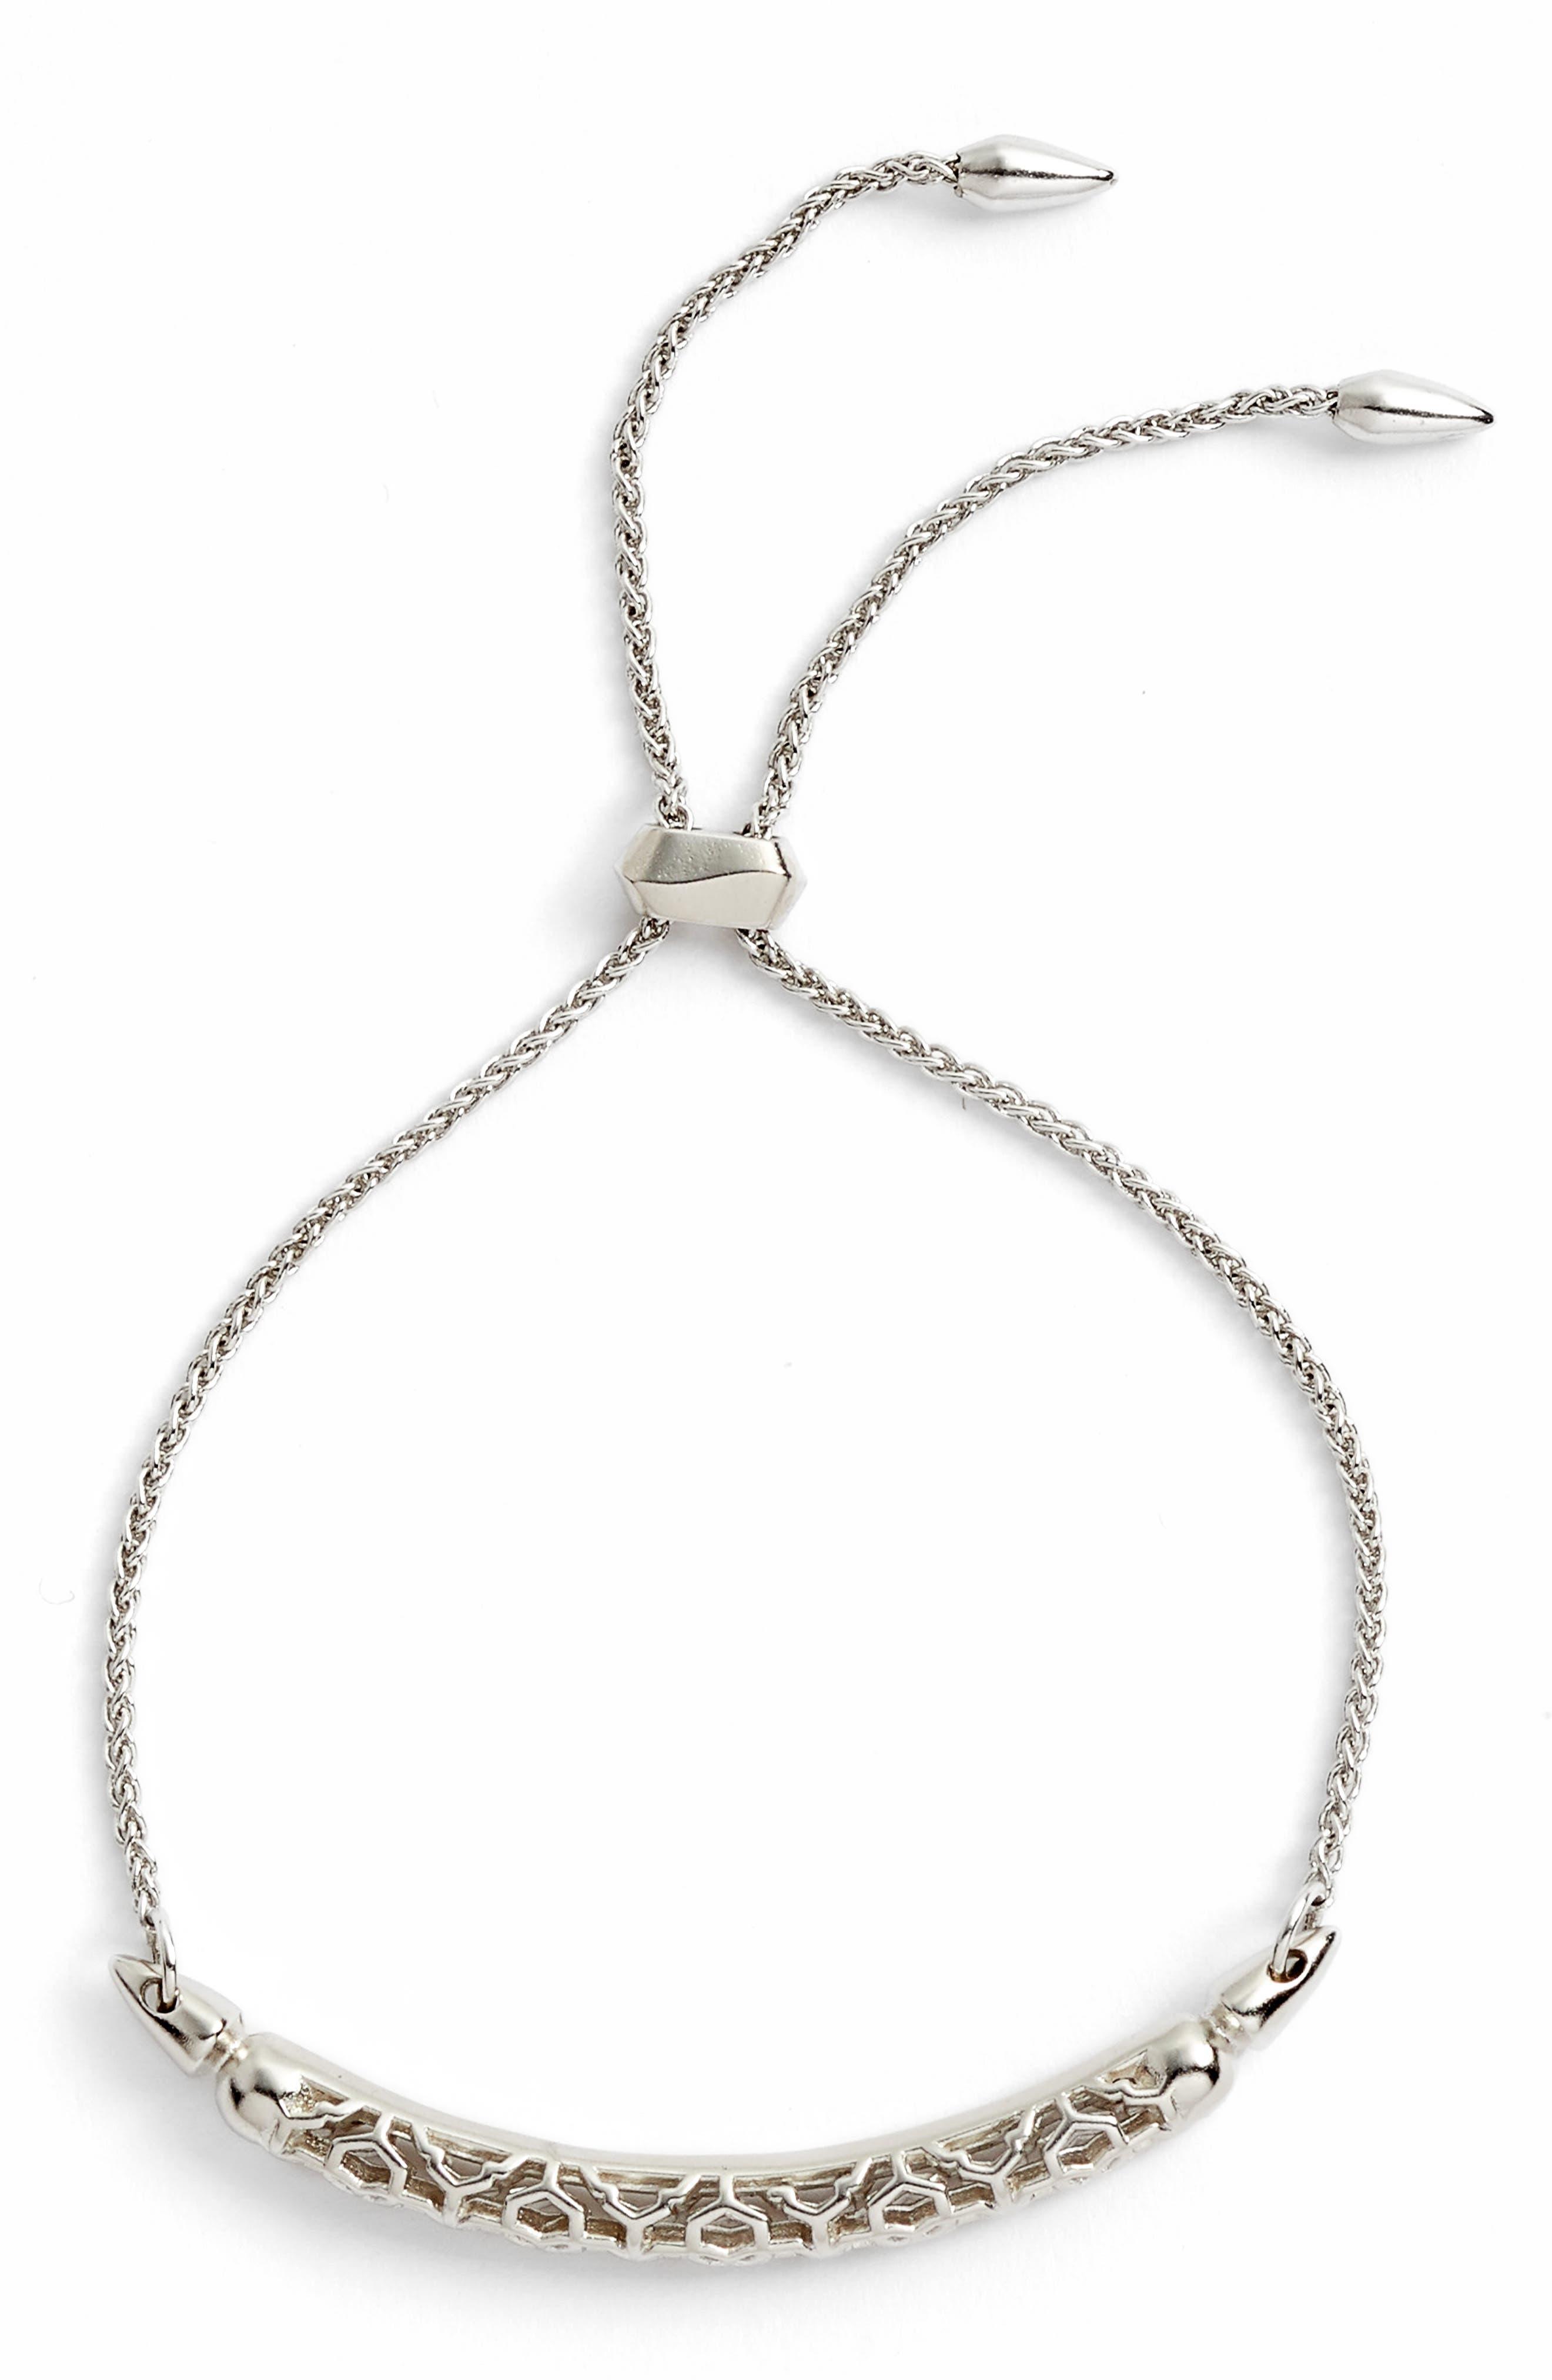 KENDRA SCOTT, Gilly Adjustable Bracelet, Main thumbnail 1, color, SILVER FILIGREE